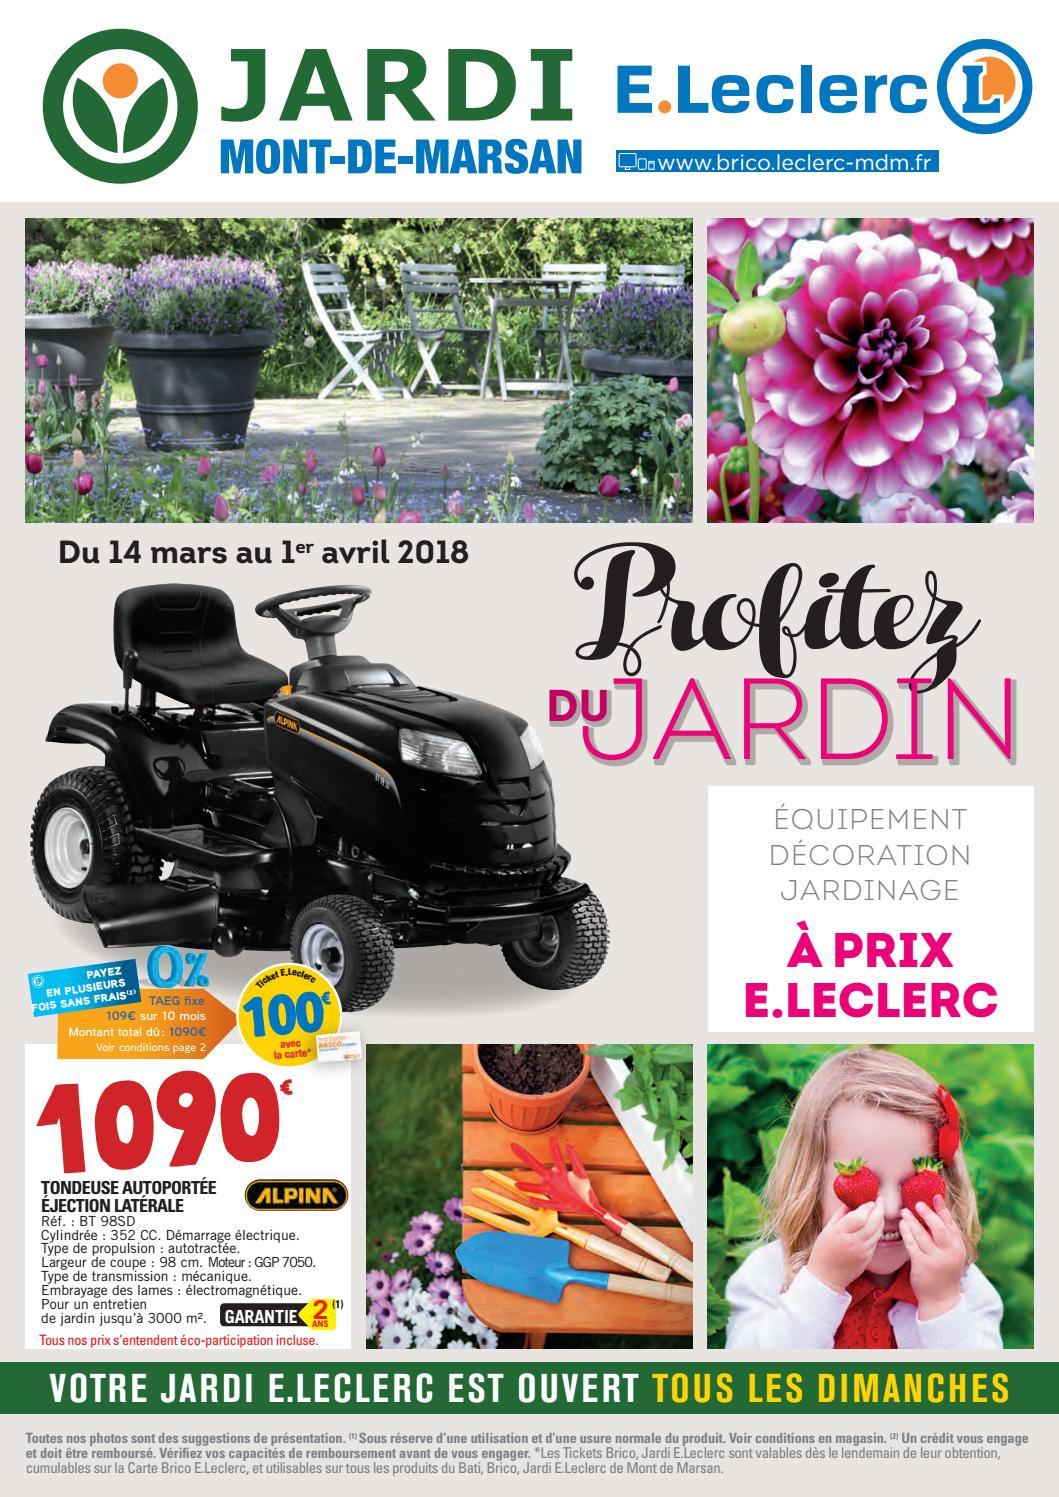 Catalogue Jardin - Jardi E.leclerc By Chou Magazine - Issuu serapportantà Table De Jardin Magasin Leclerc